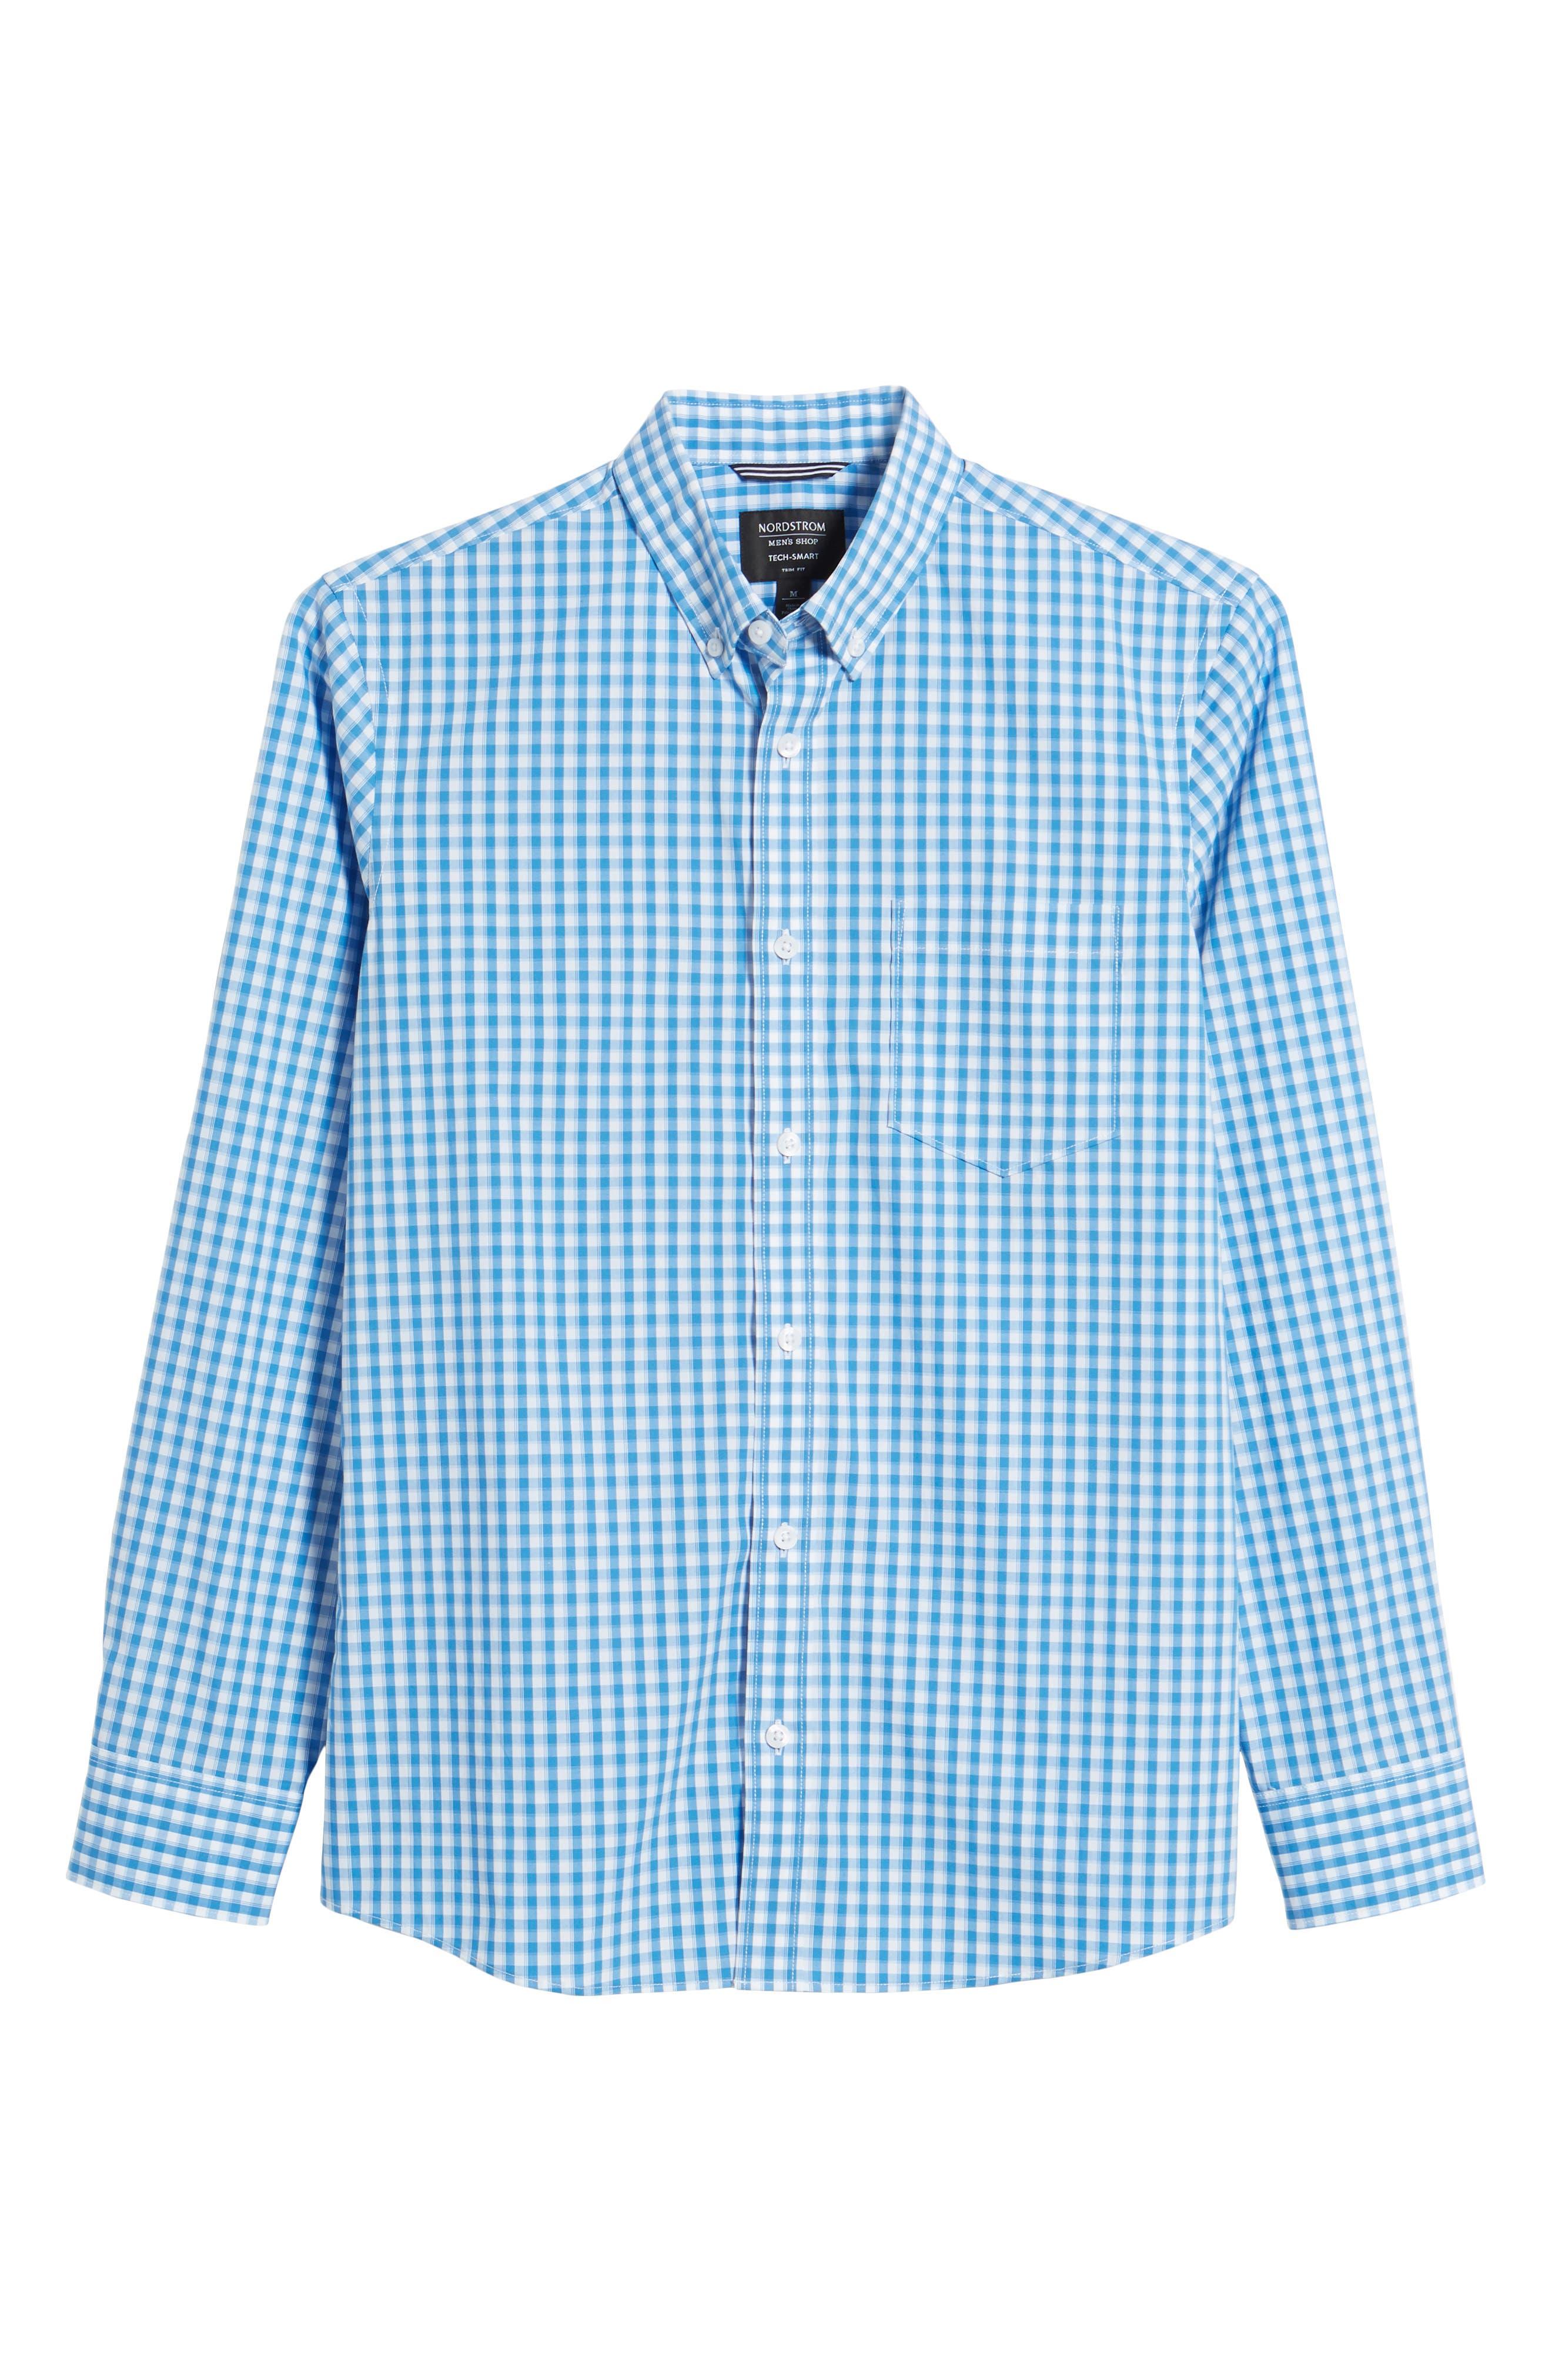 Tech-Smart Trim Fit Check Sport Shirt,                             Alternate thumbnail 6, color,                             Blue Camp White Gingham